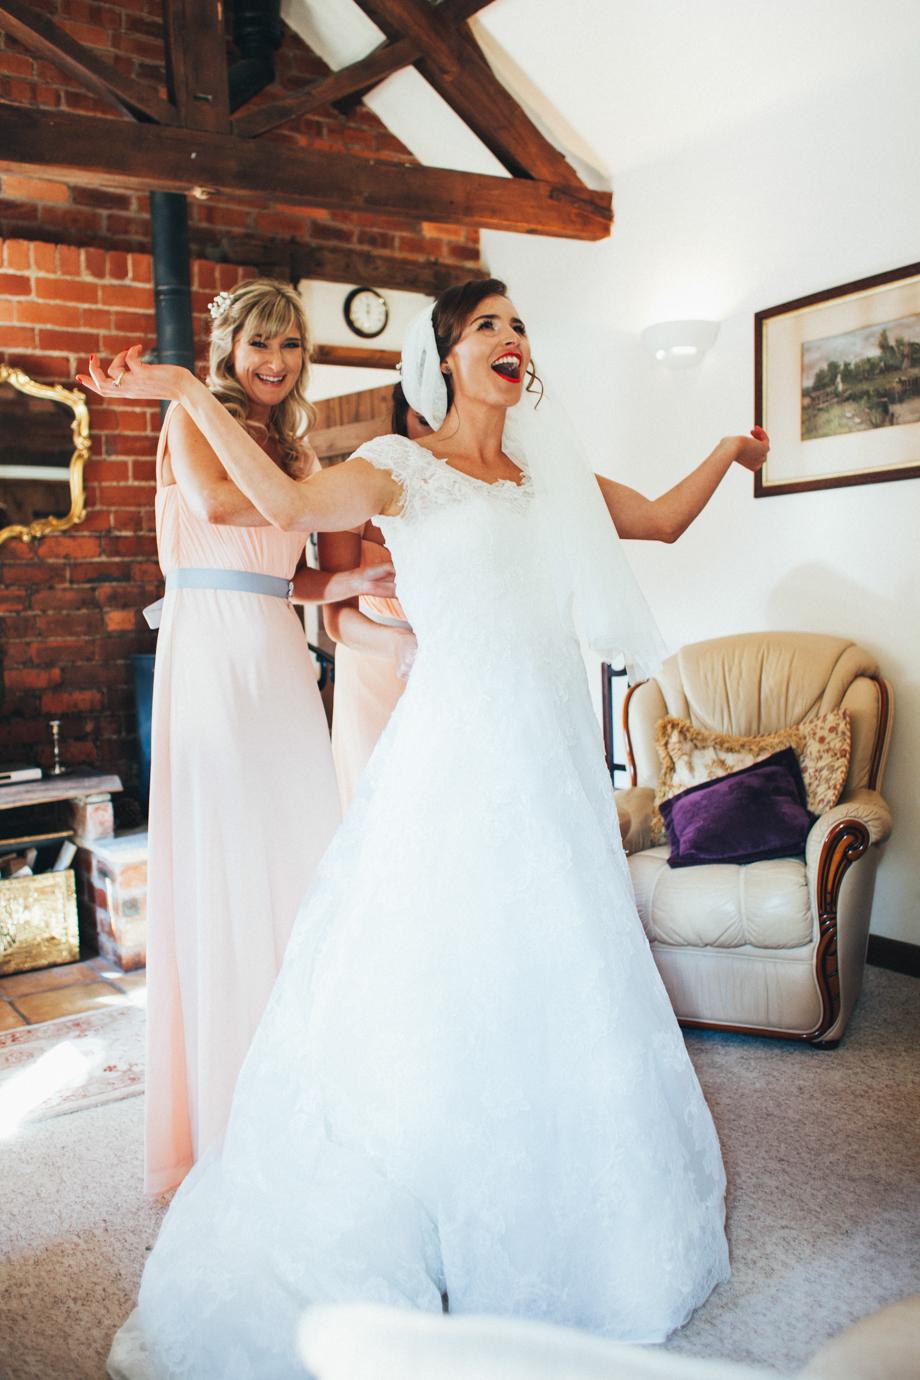 Shropshire-Festival-Wedding-13